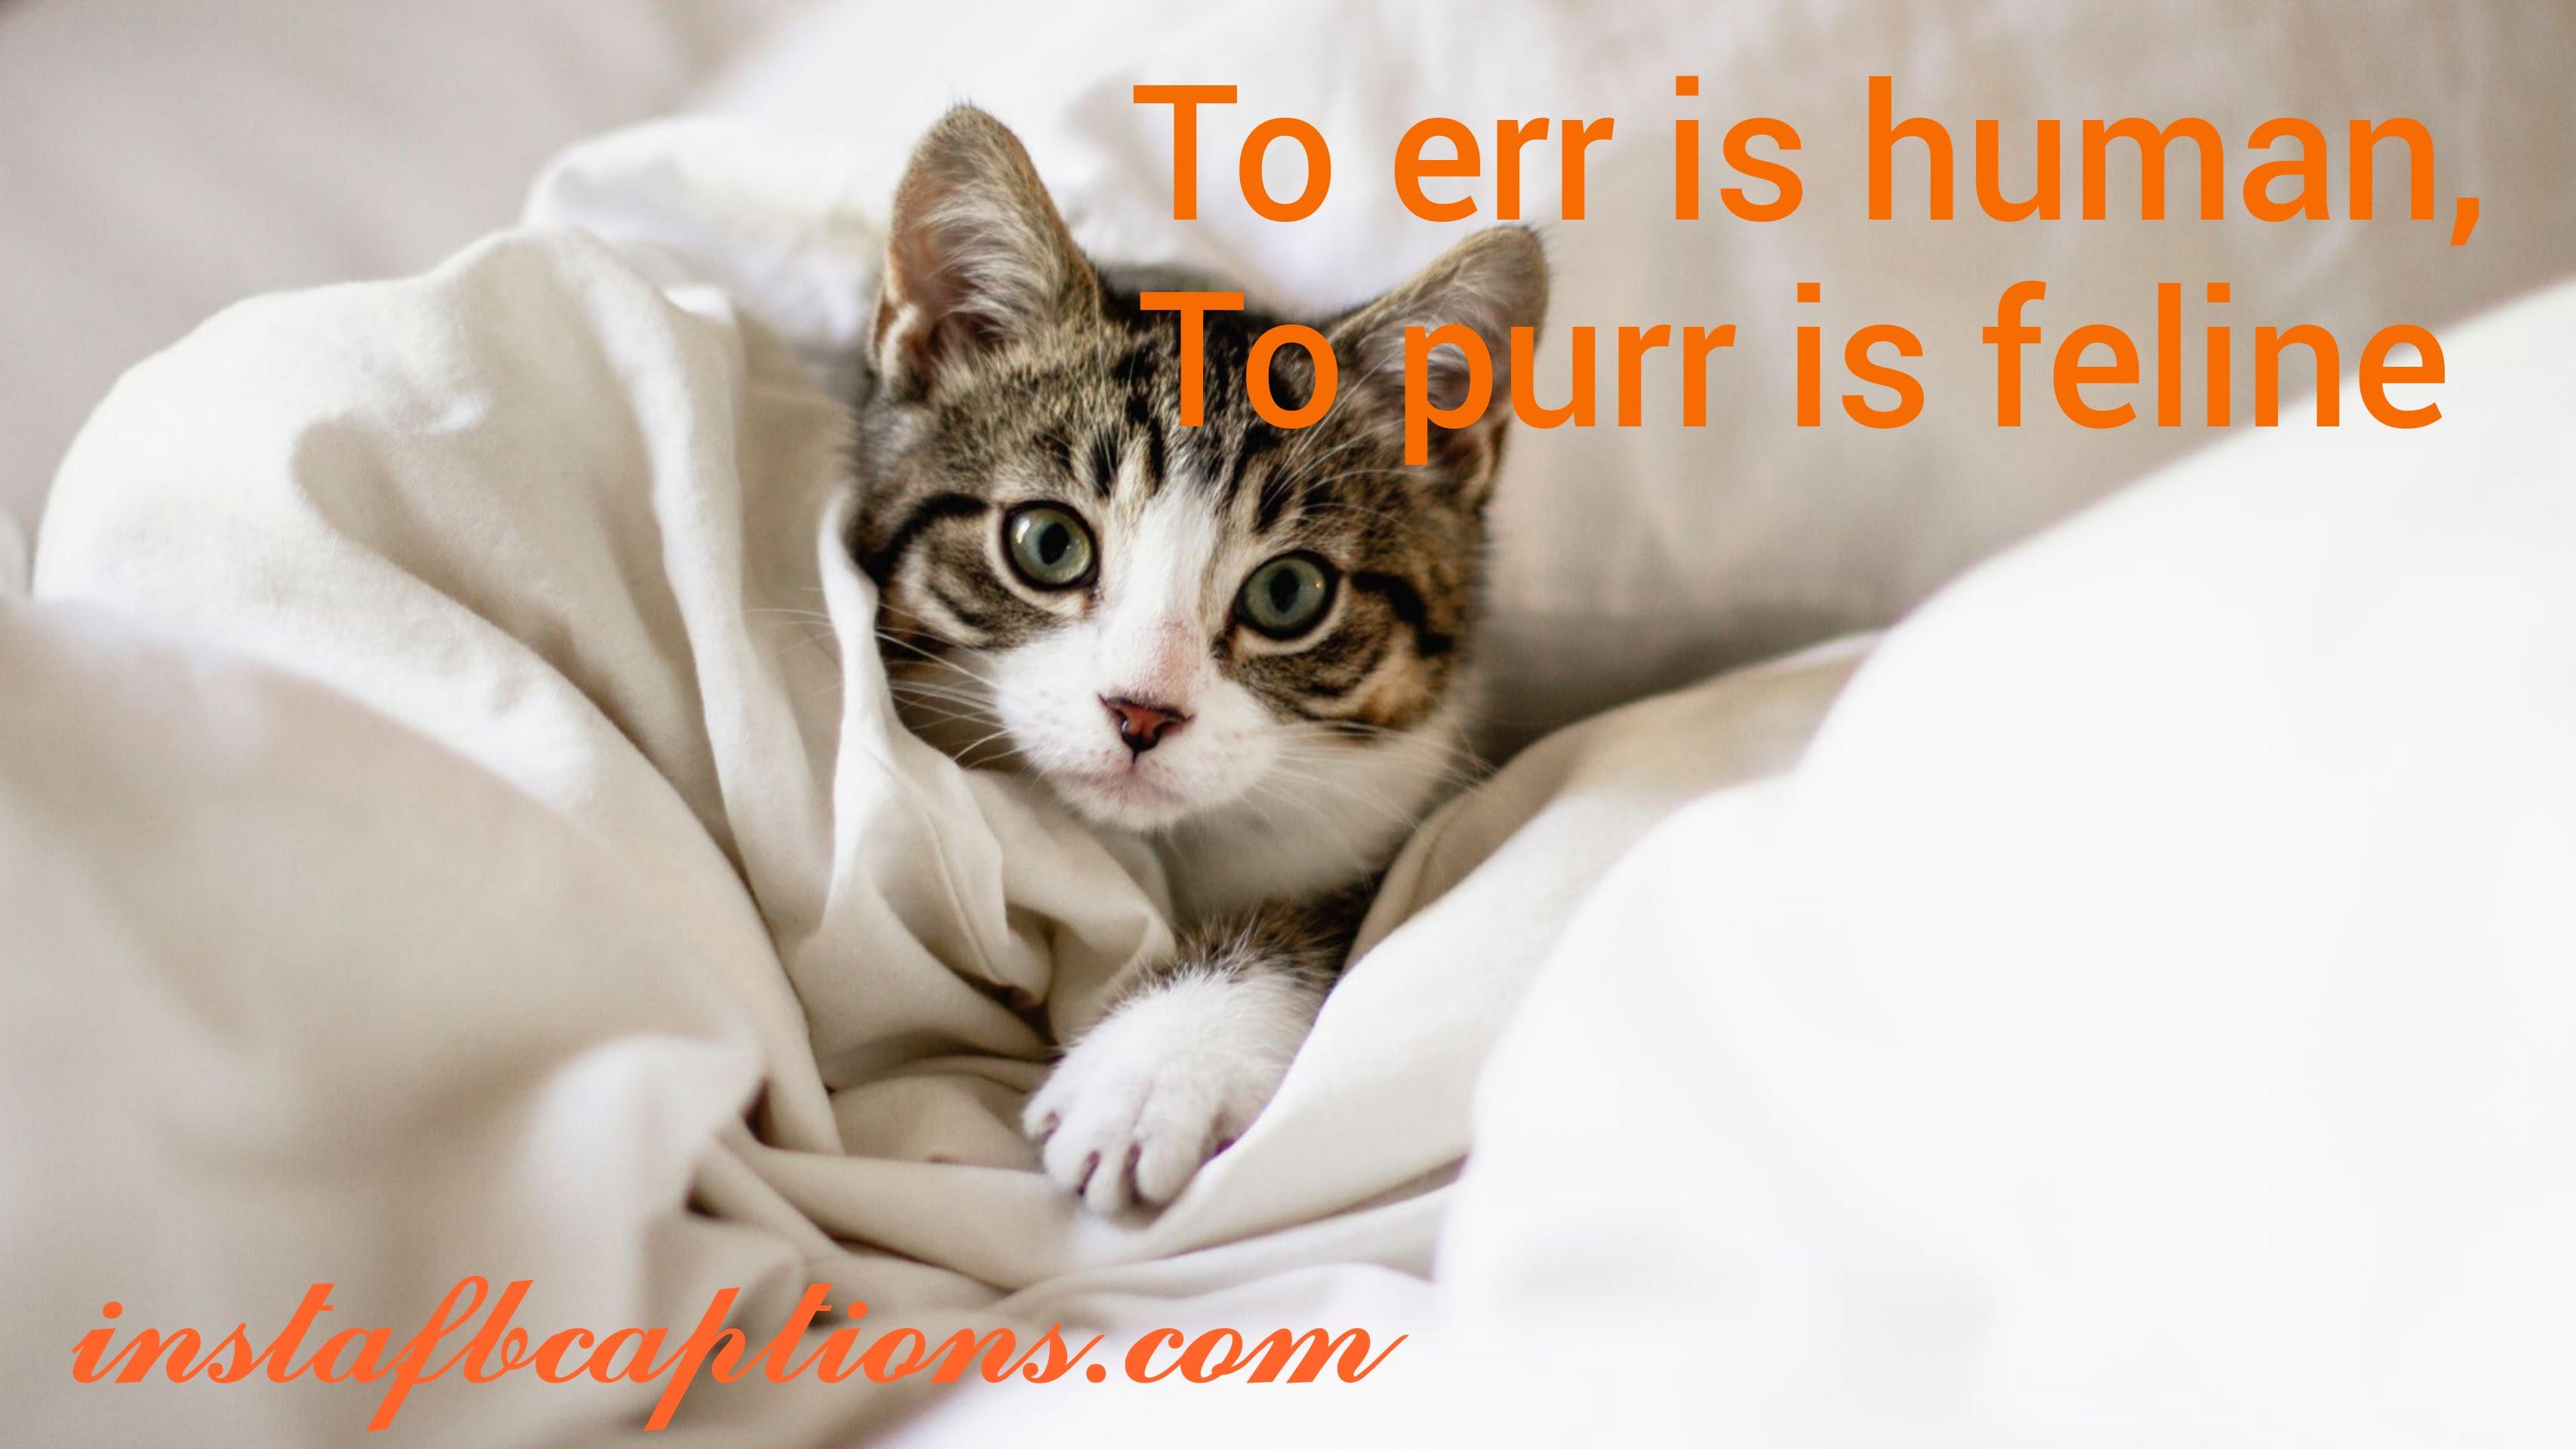 Cat Quotes For Instagram  - Cat Quotes for Instagram - 150+ CATS Instagram Captions 2021